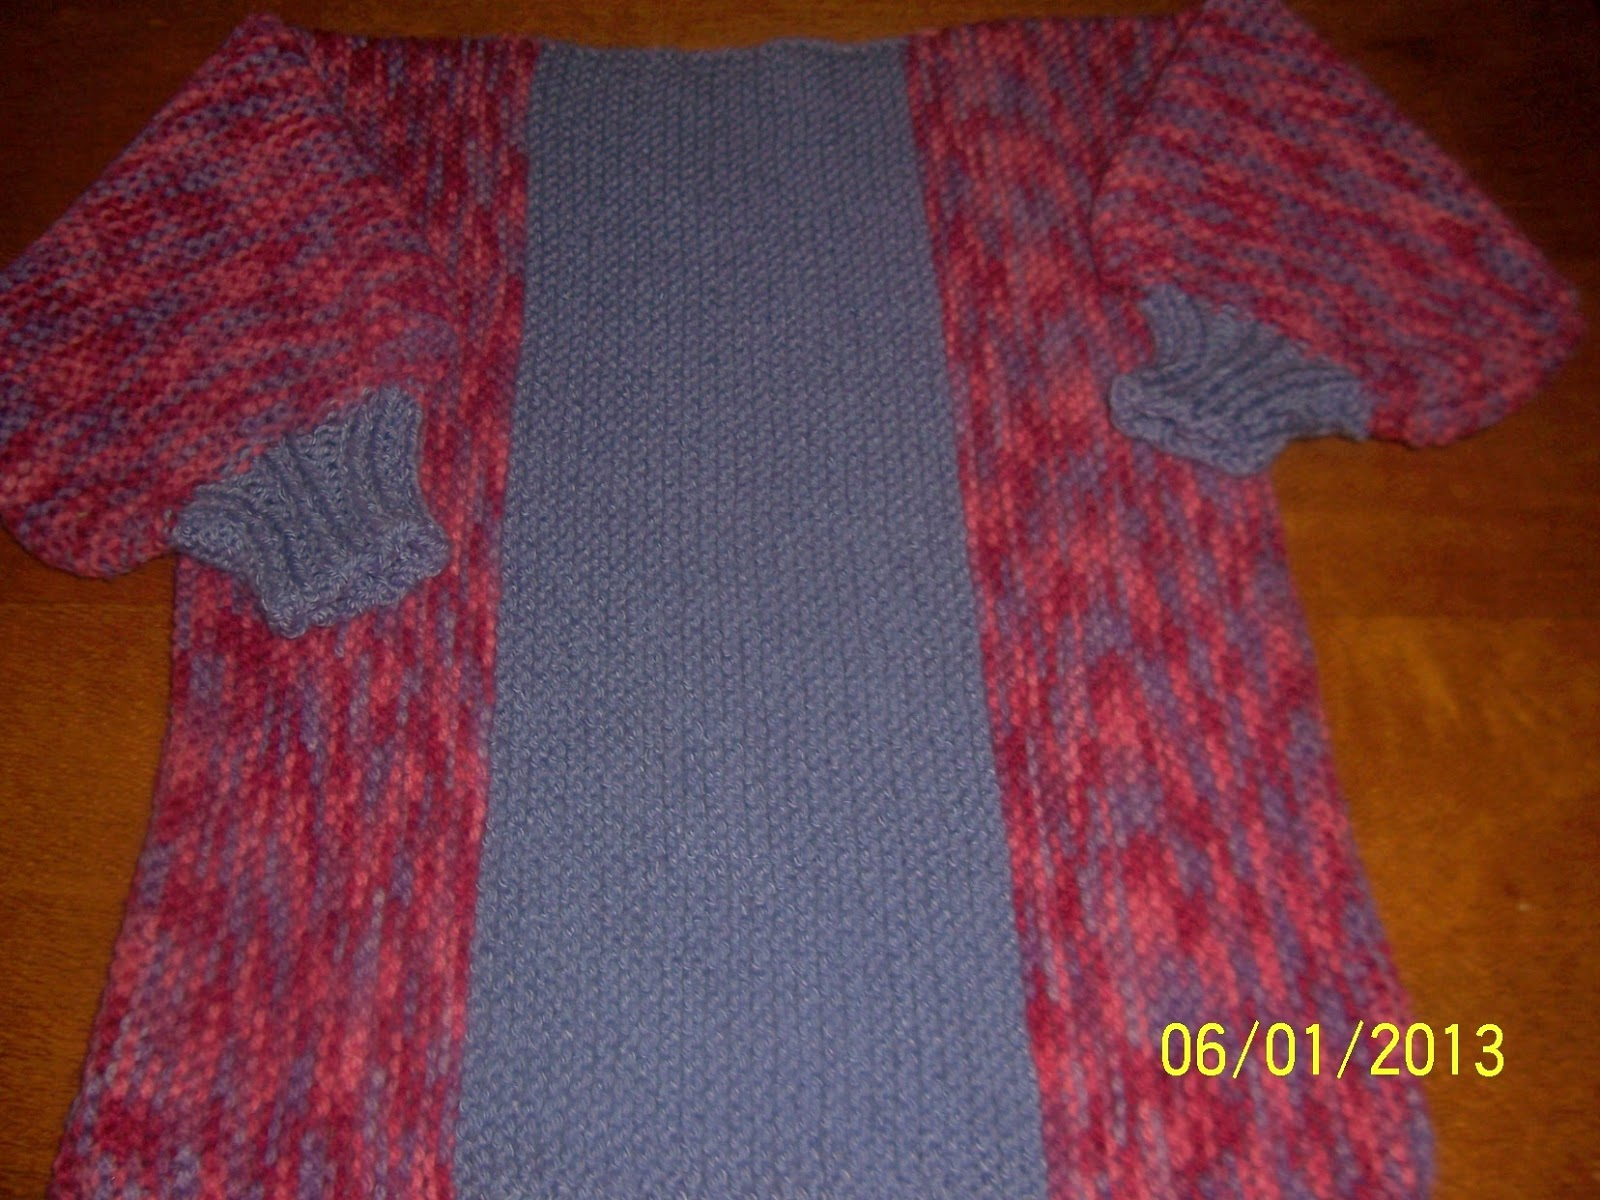 Knitting Pattern For Wallaby Sweater : Grandmas Knitting Place: May 2013